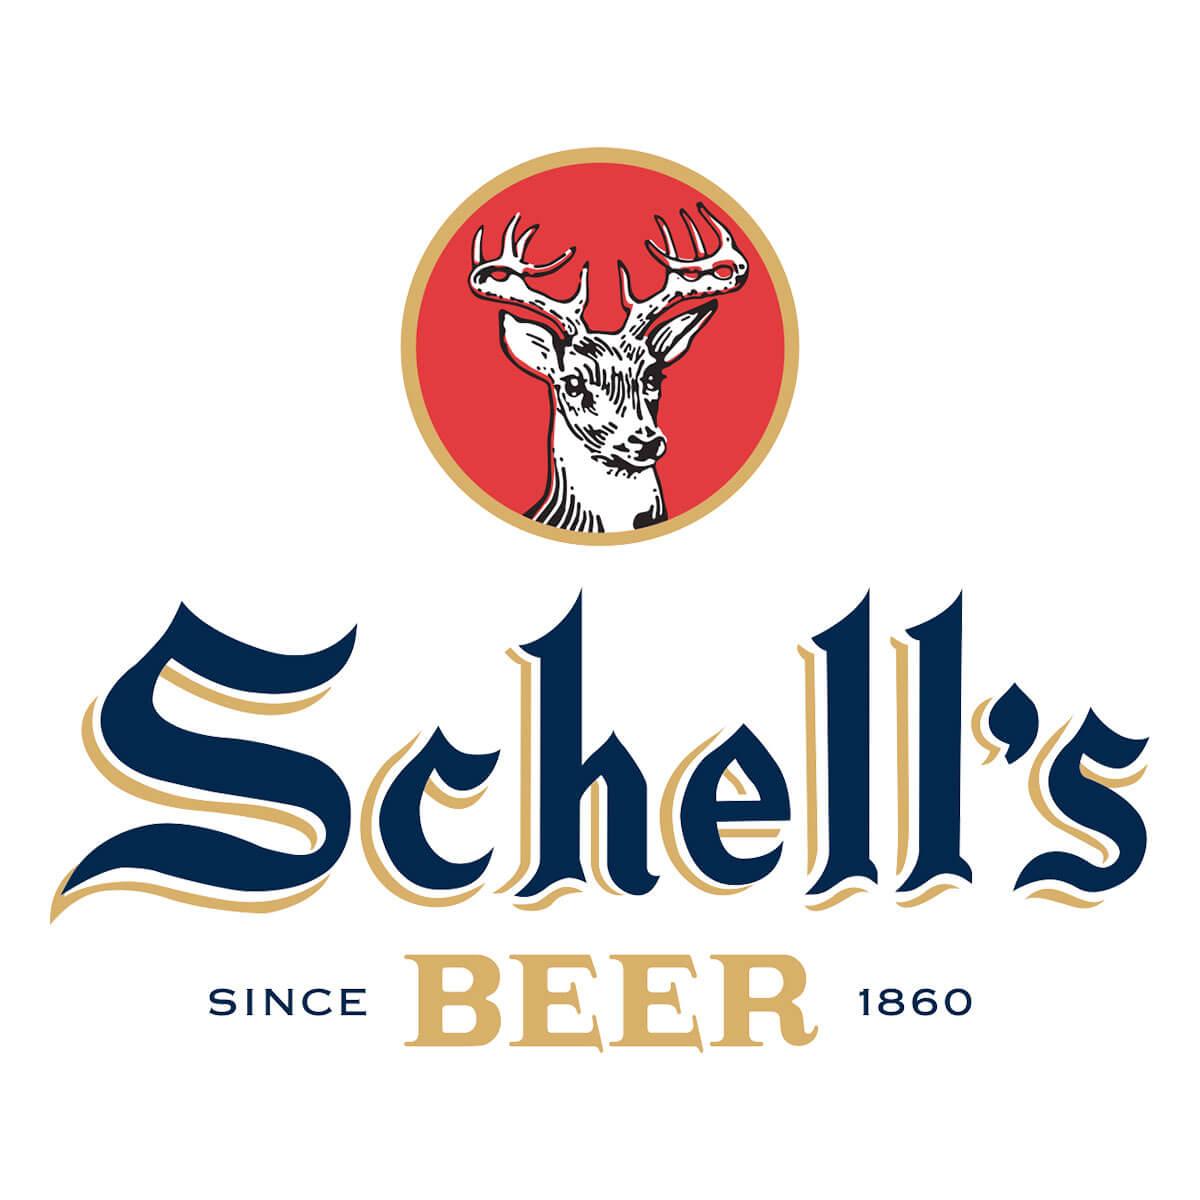 August Schell Brewing Co. Logo